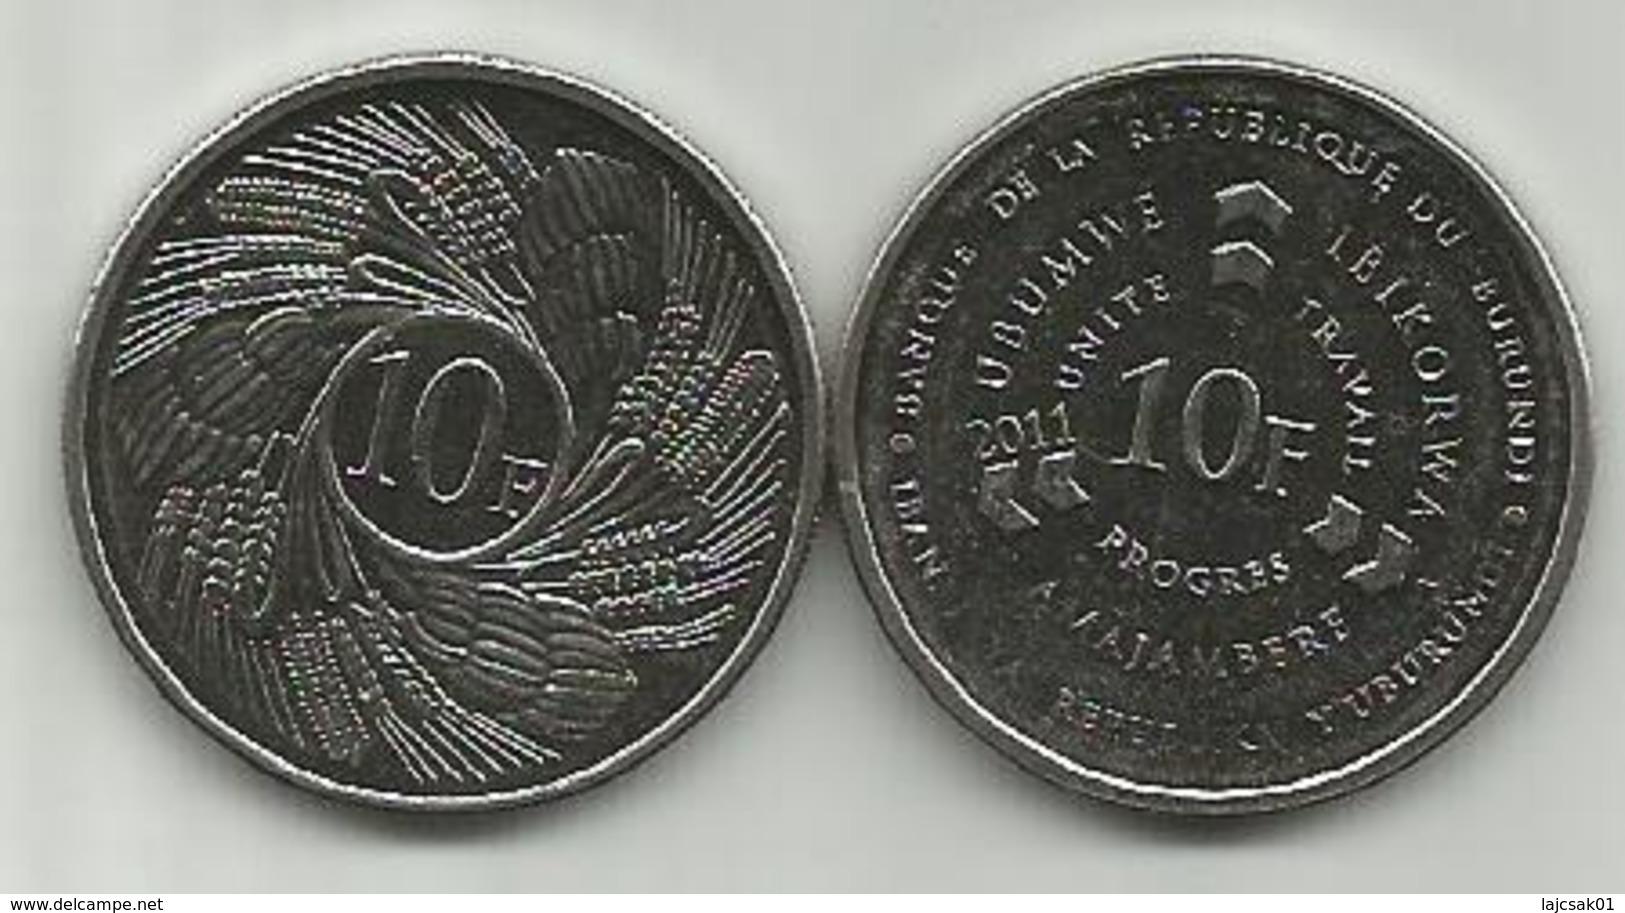 Burundi 10 Francs  2011. High Grade - Burundi